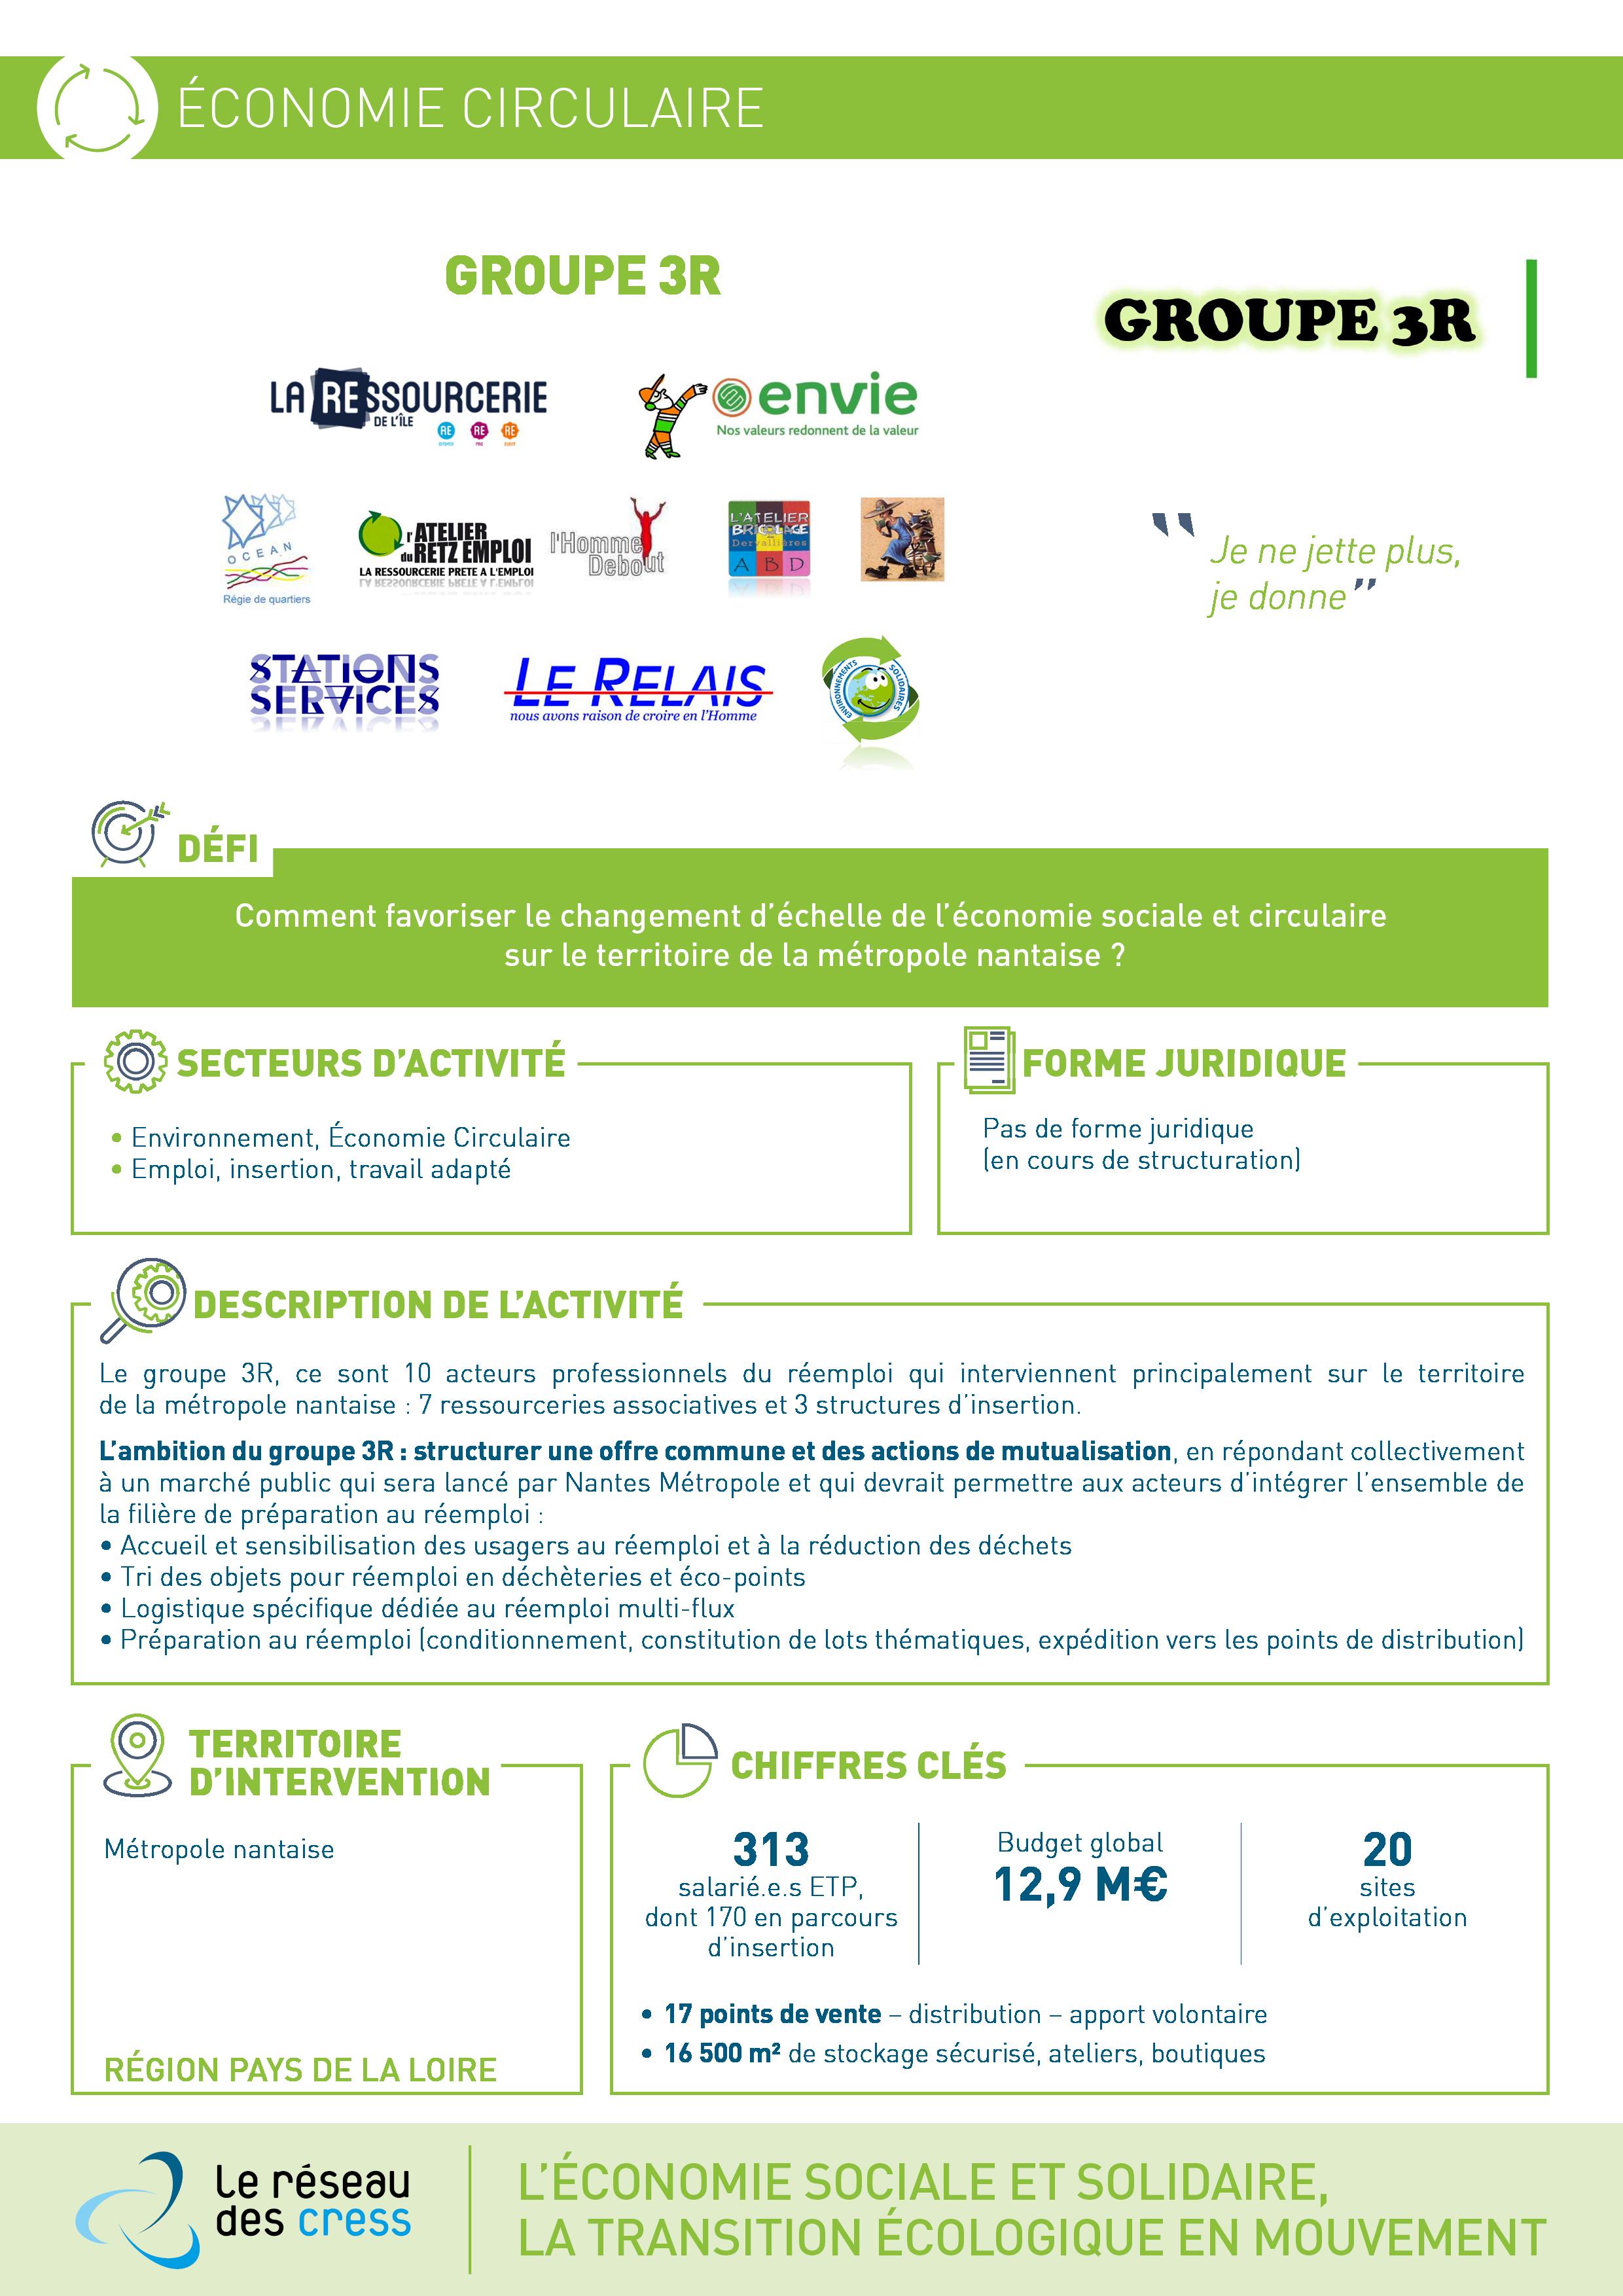 Fiche initiative GROUPE 3R - Loire-Atlantique